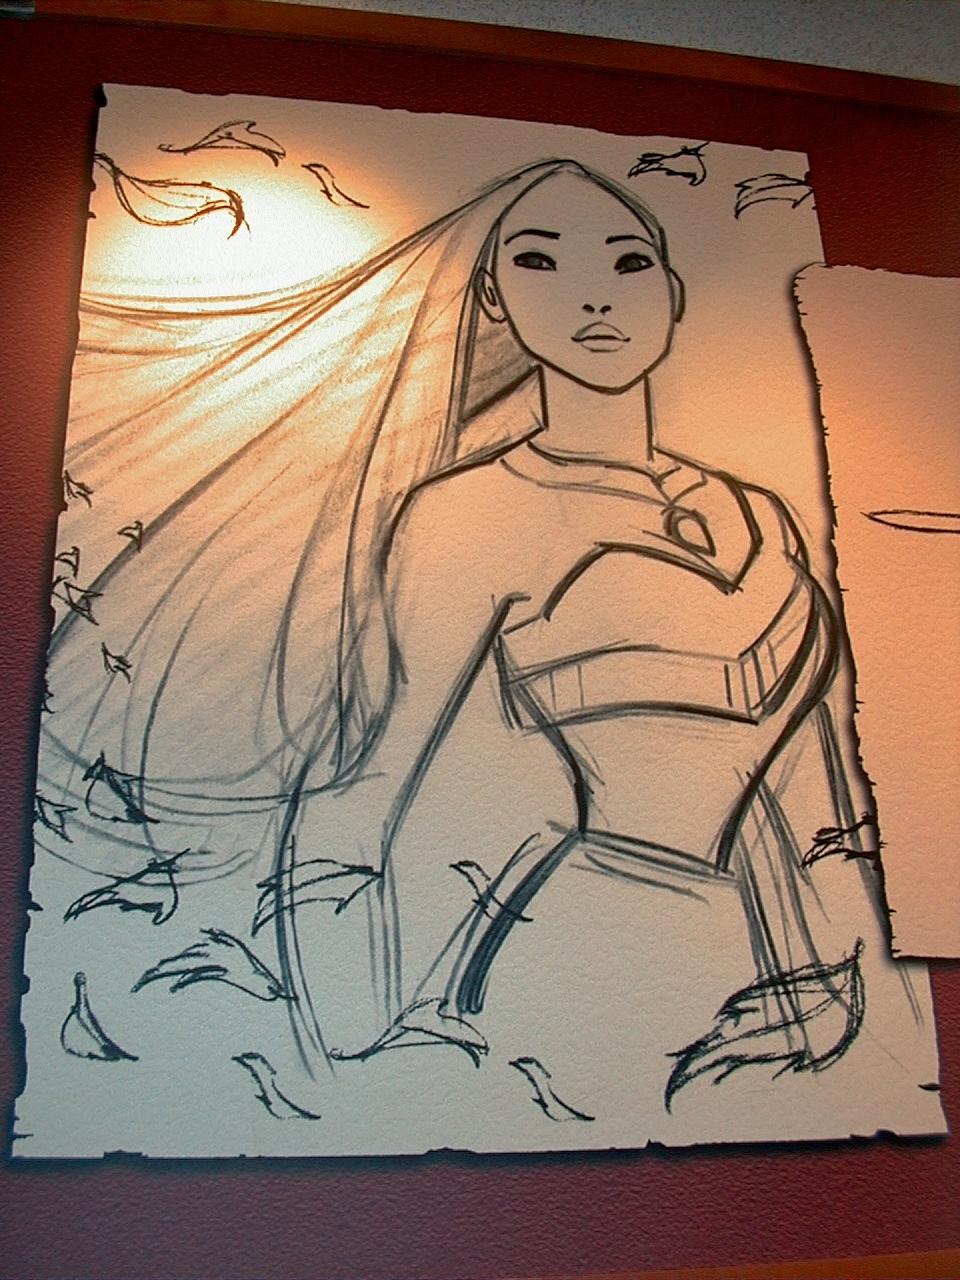 Disney Pocahontas Drawing Pocahontas Drawing at Disney